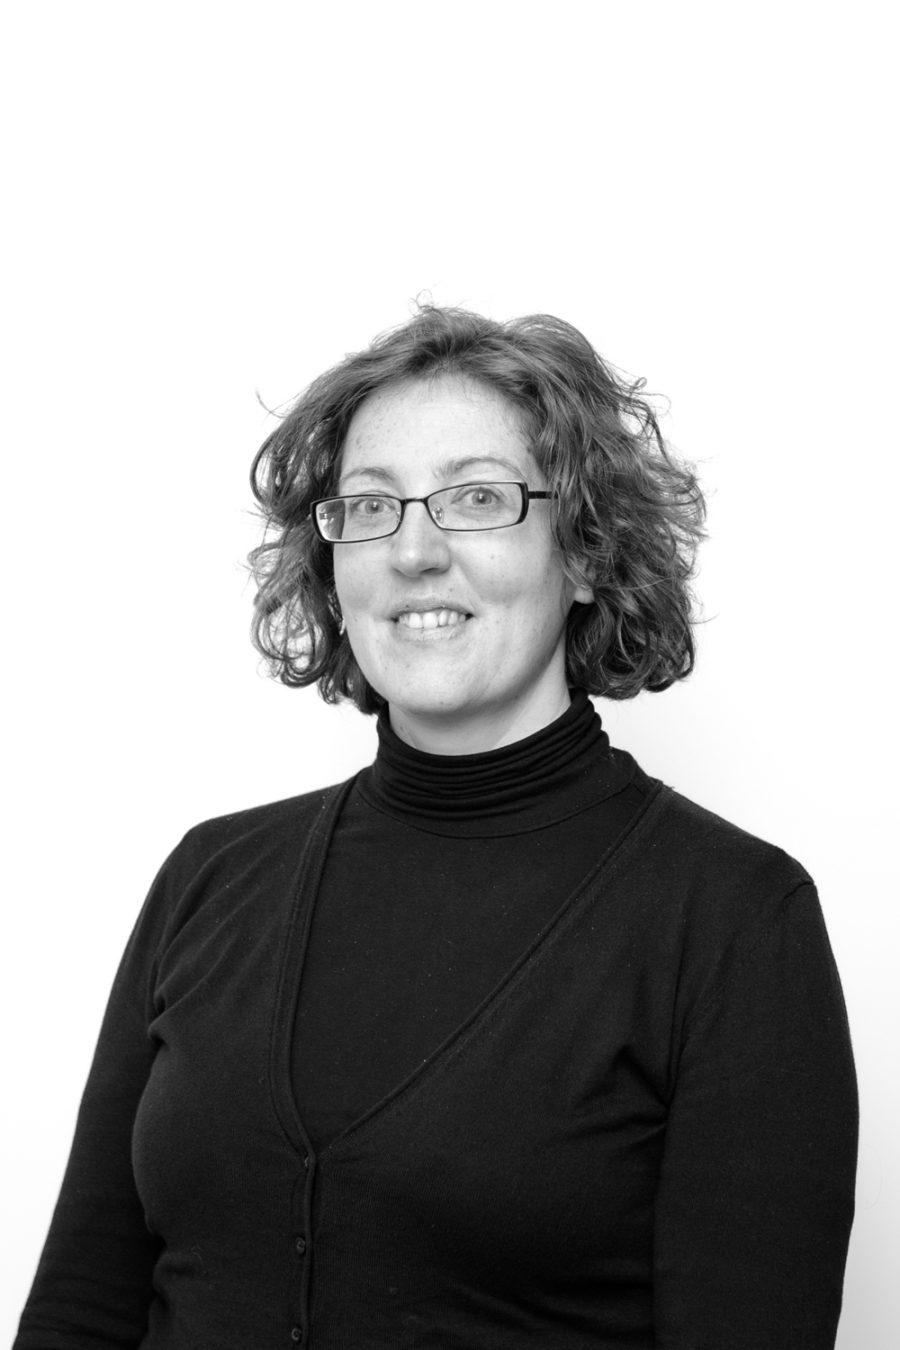 Melissa Janssens